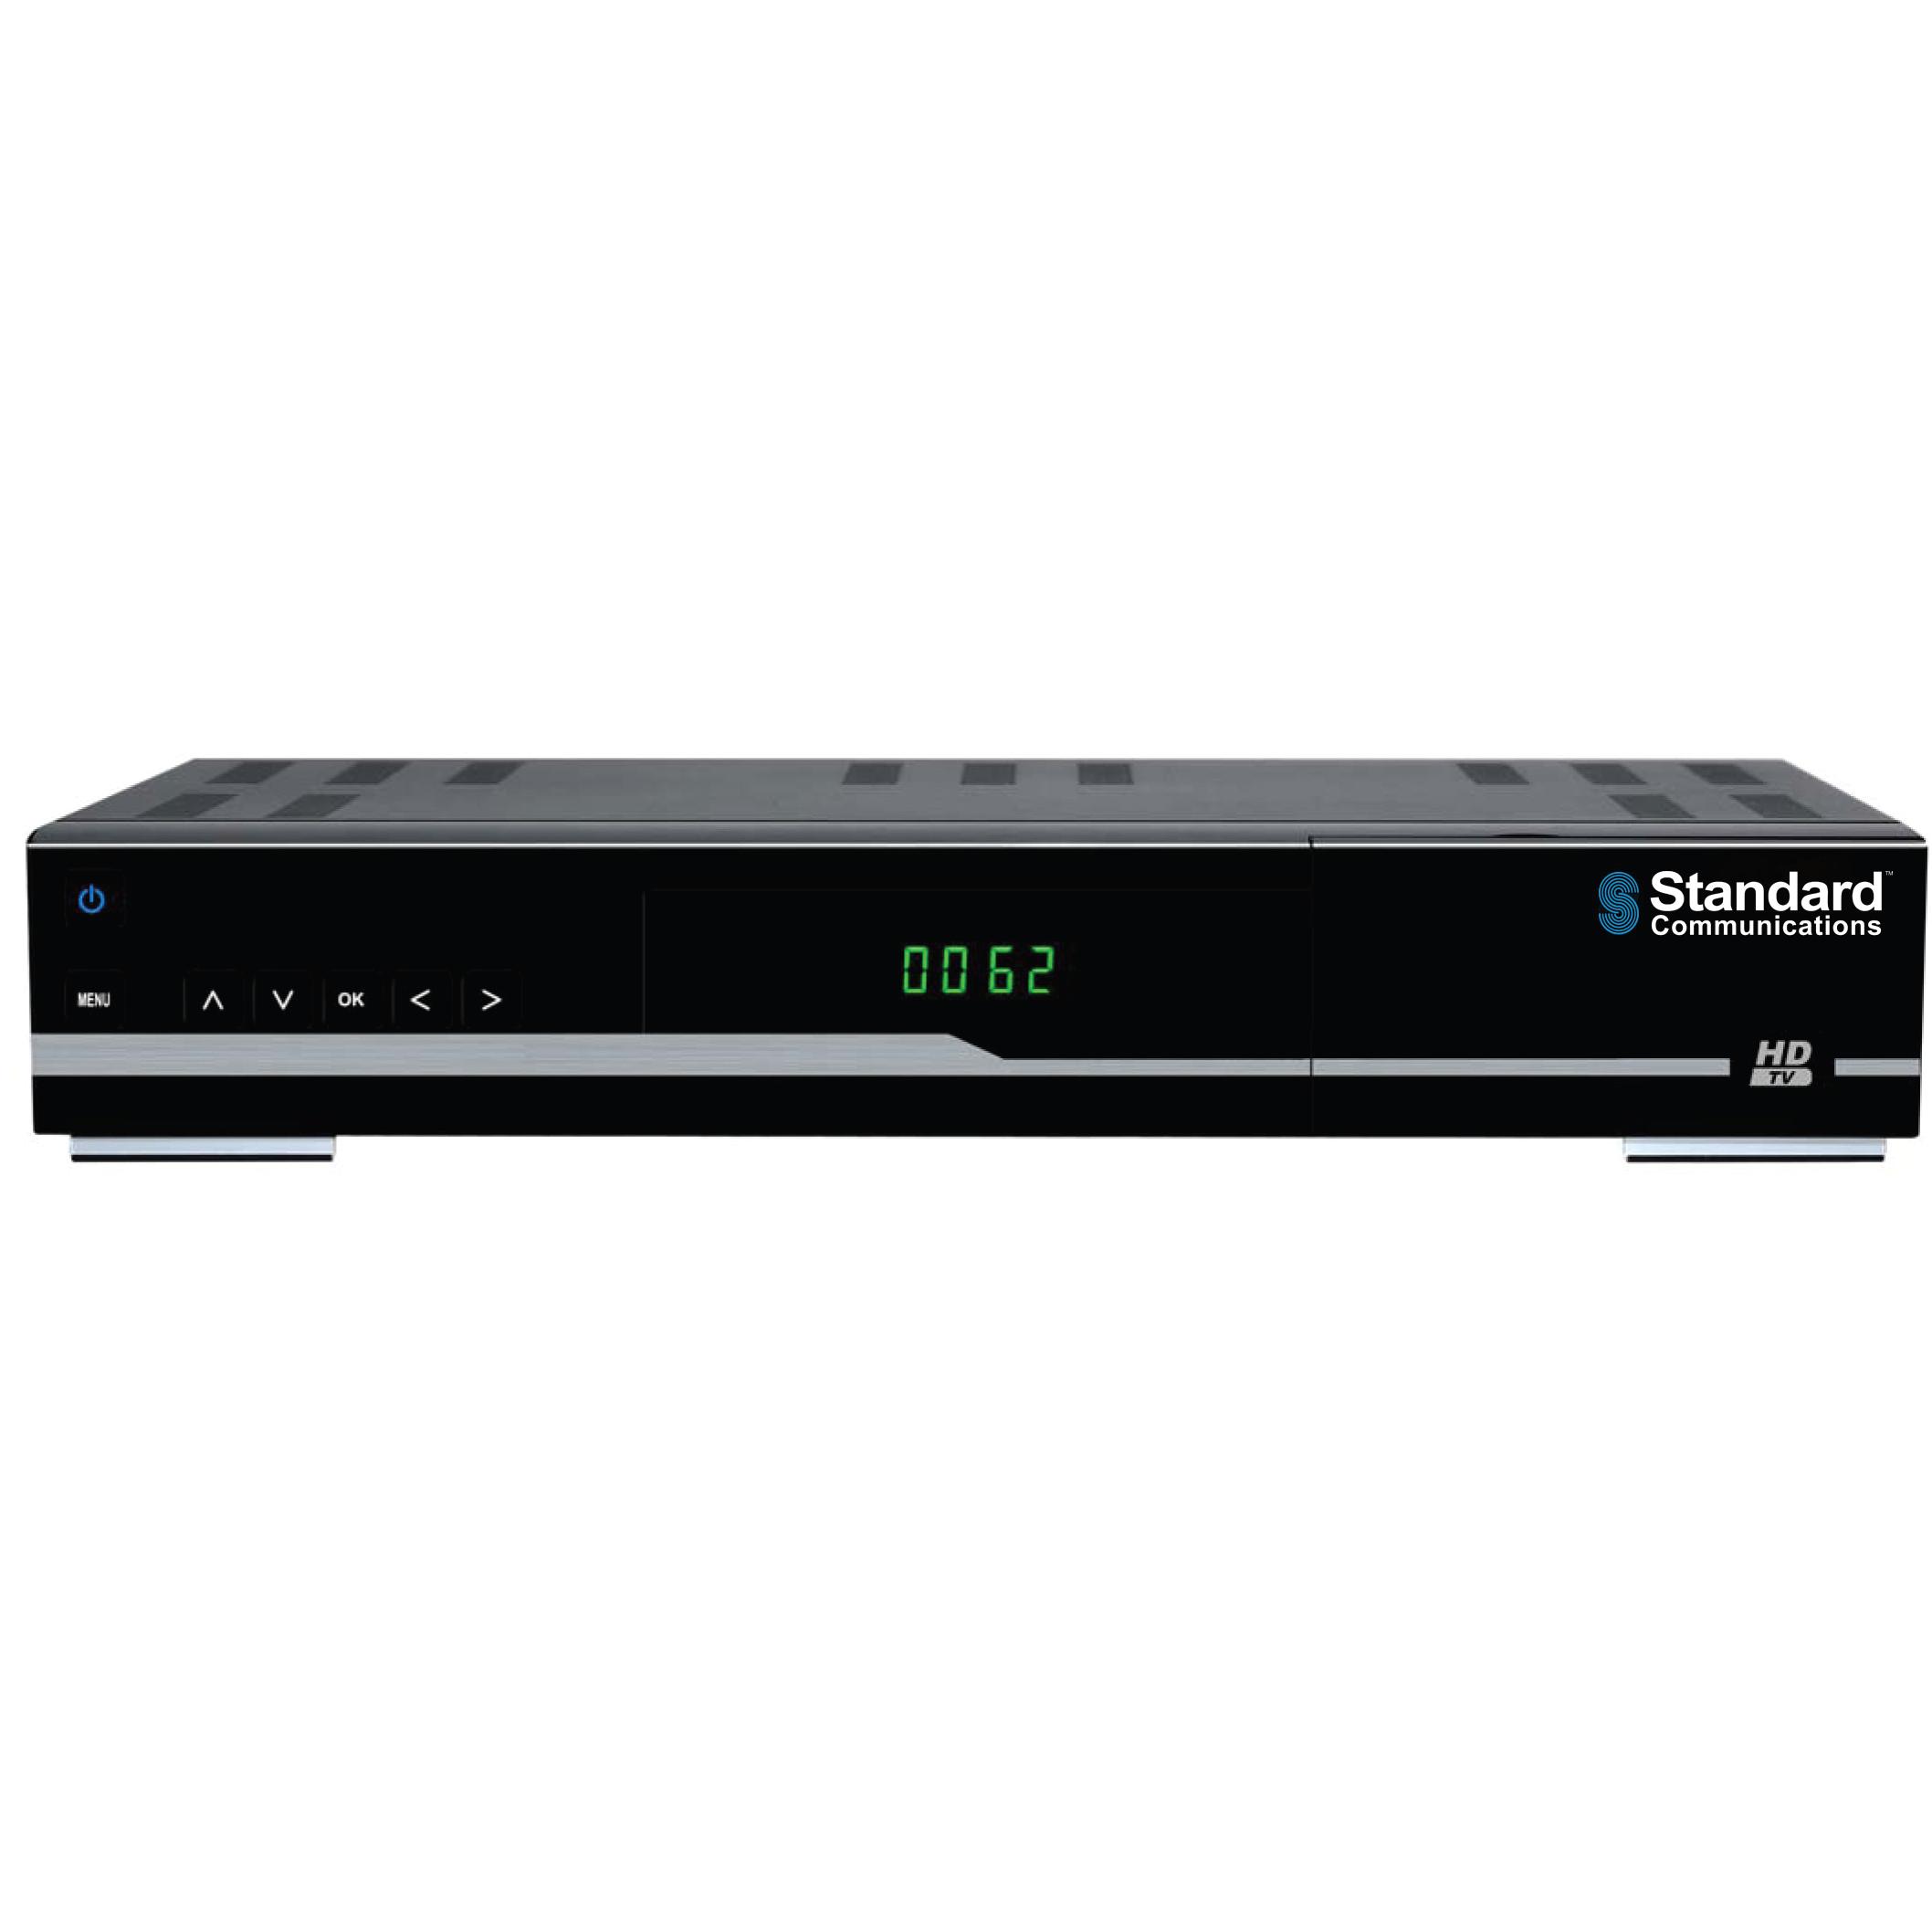 Standard Communications STB HD4PT C SC HD Twin PVR